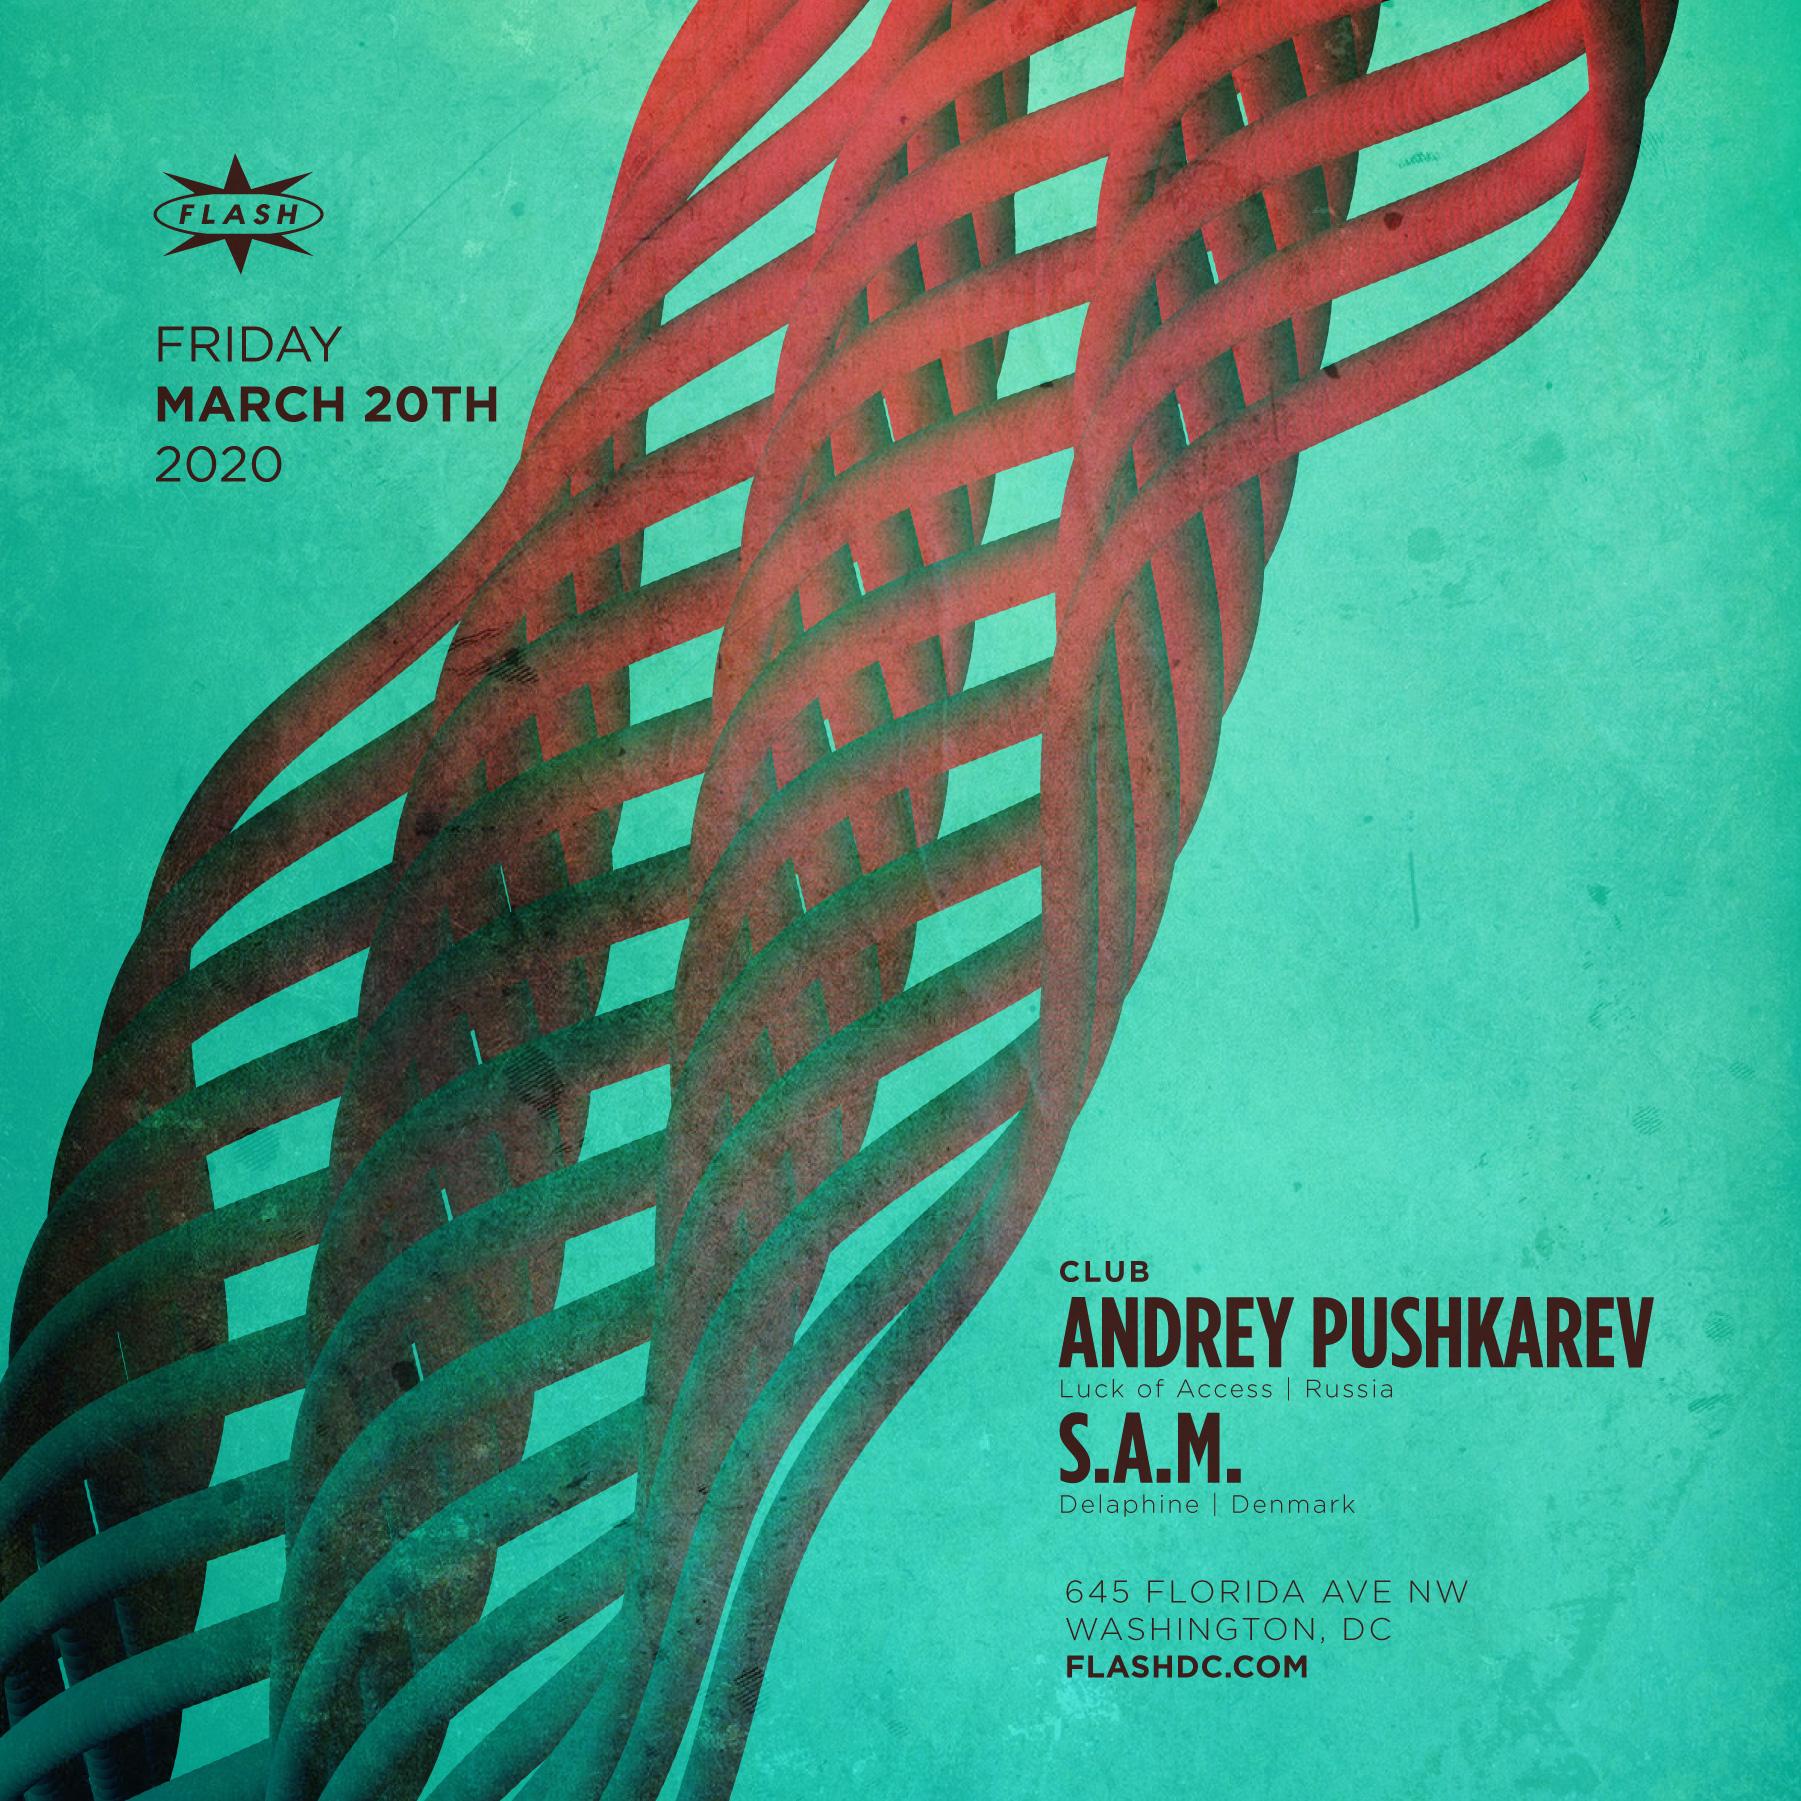 Andrey Pushkarev - S.A.M. event thumbnail